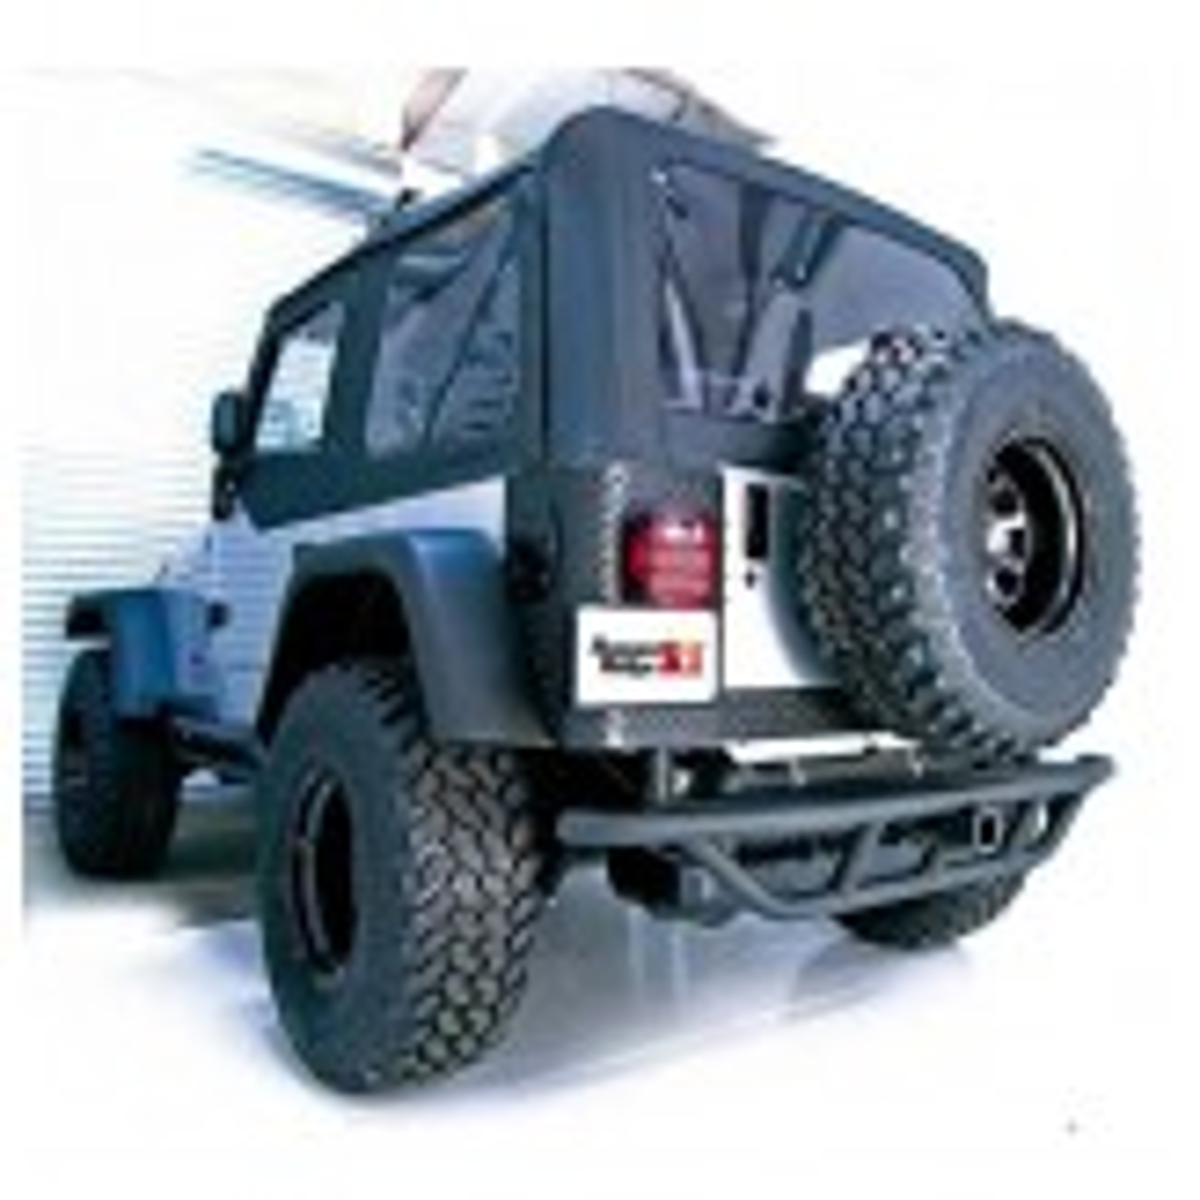 RRC Rear Bumper, 2 Inch Receiver Hitch; 87-06 Jeep Wrangler YJ/TJ